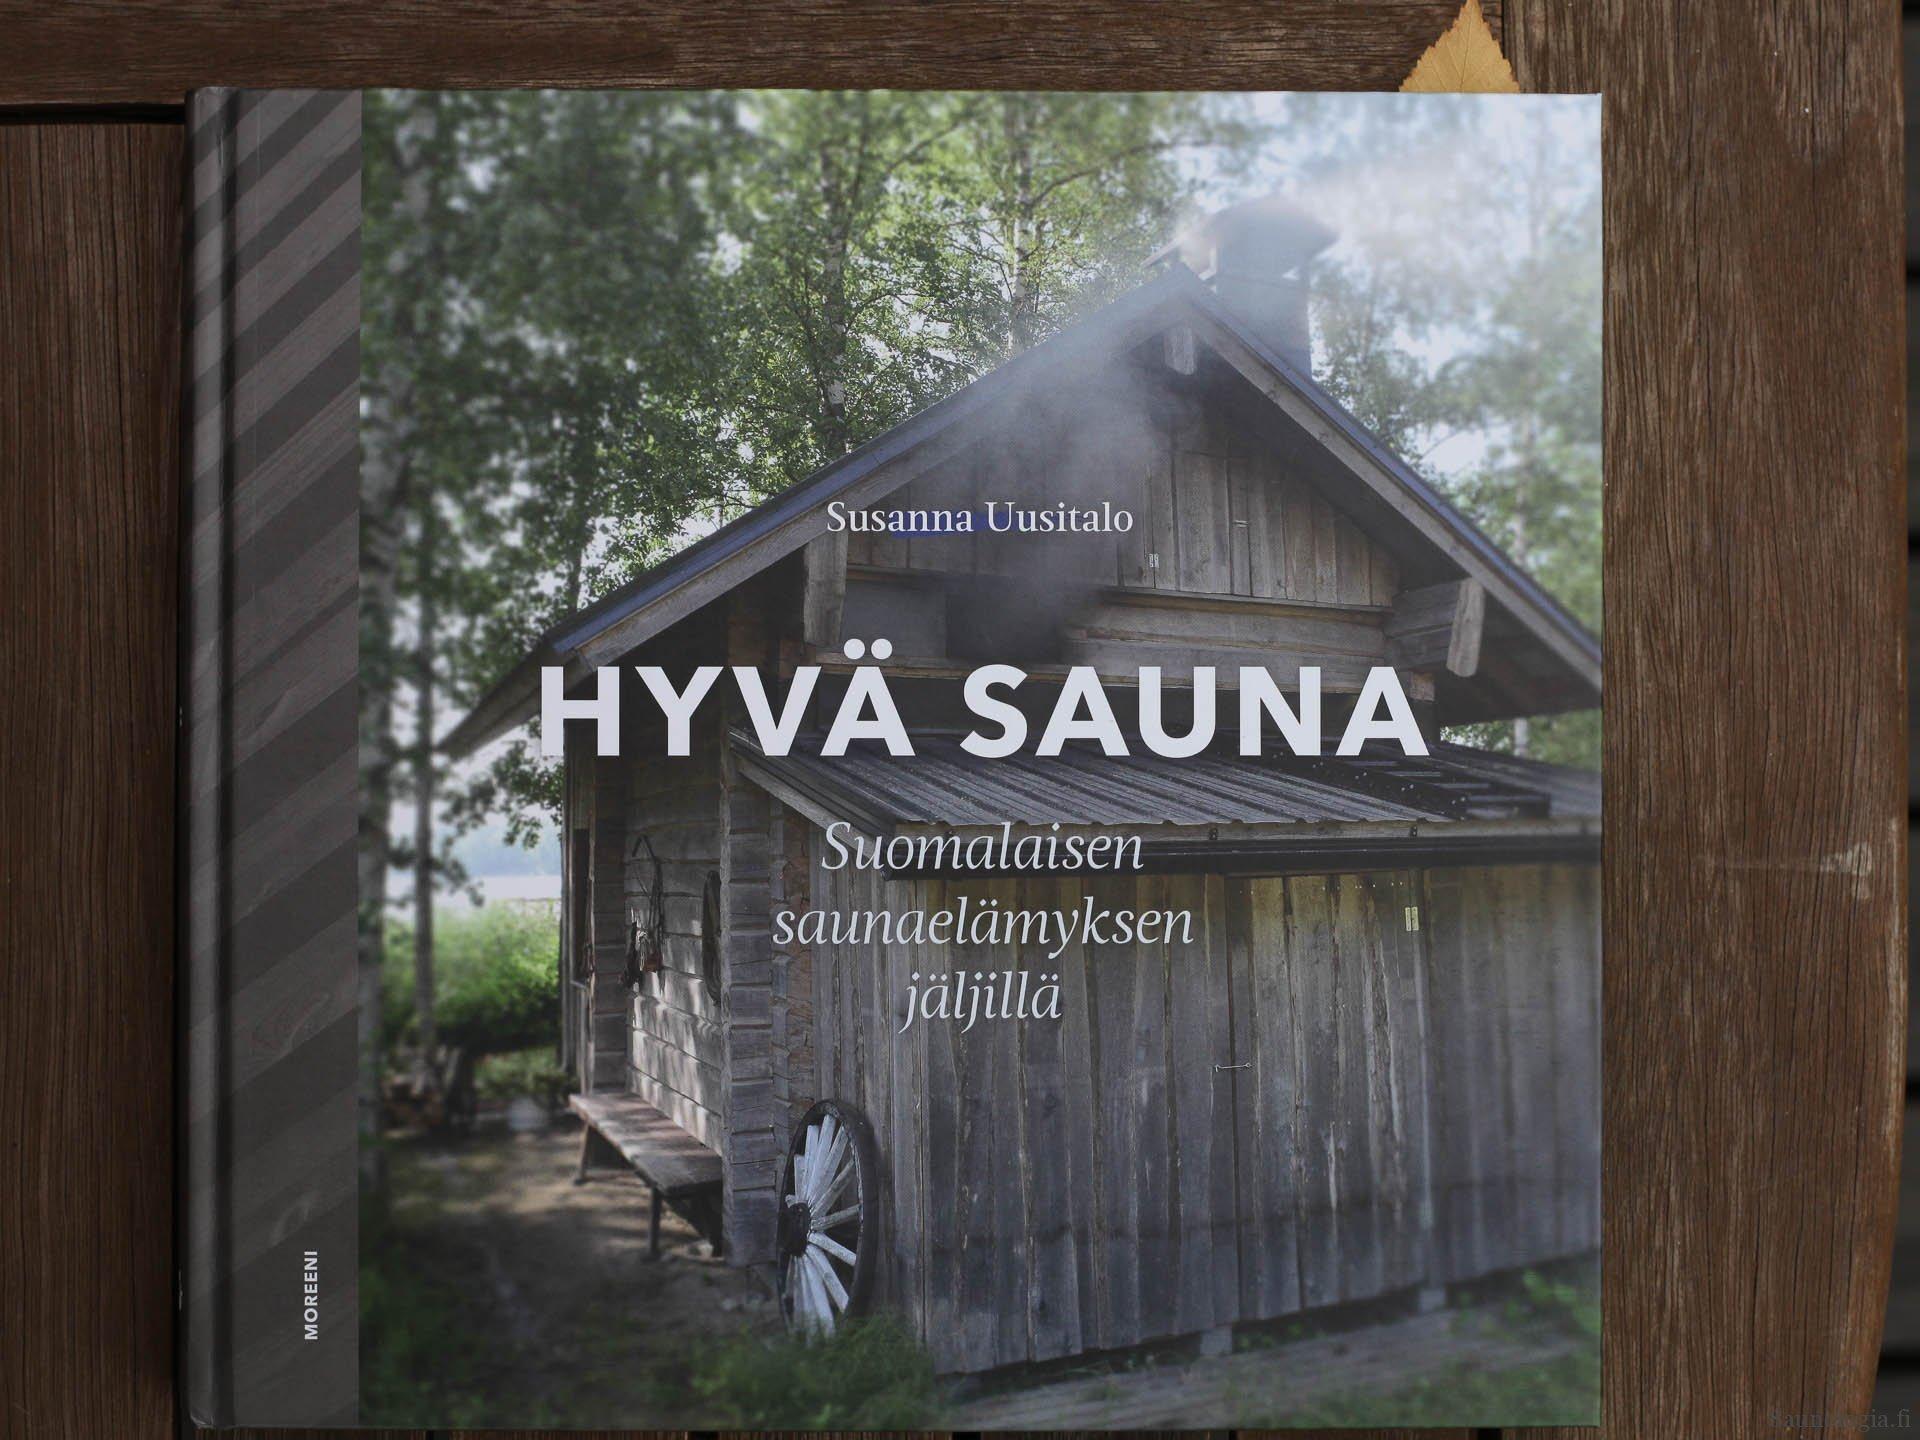 170802-Hyva-sauna-Kansi-repro